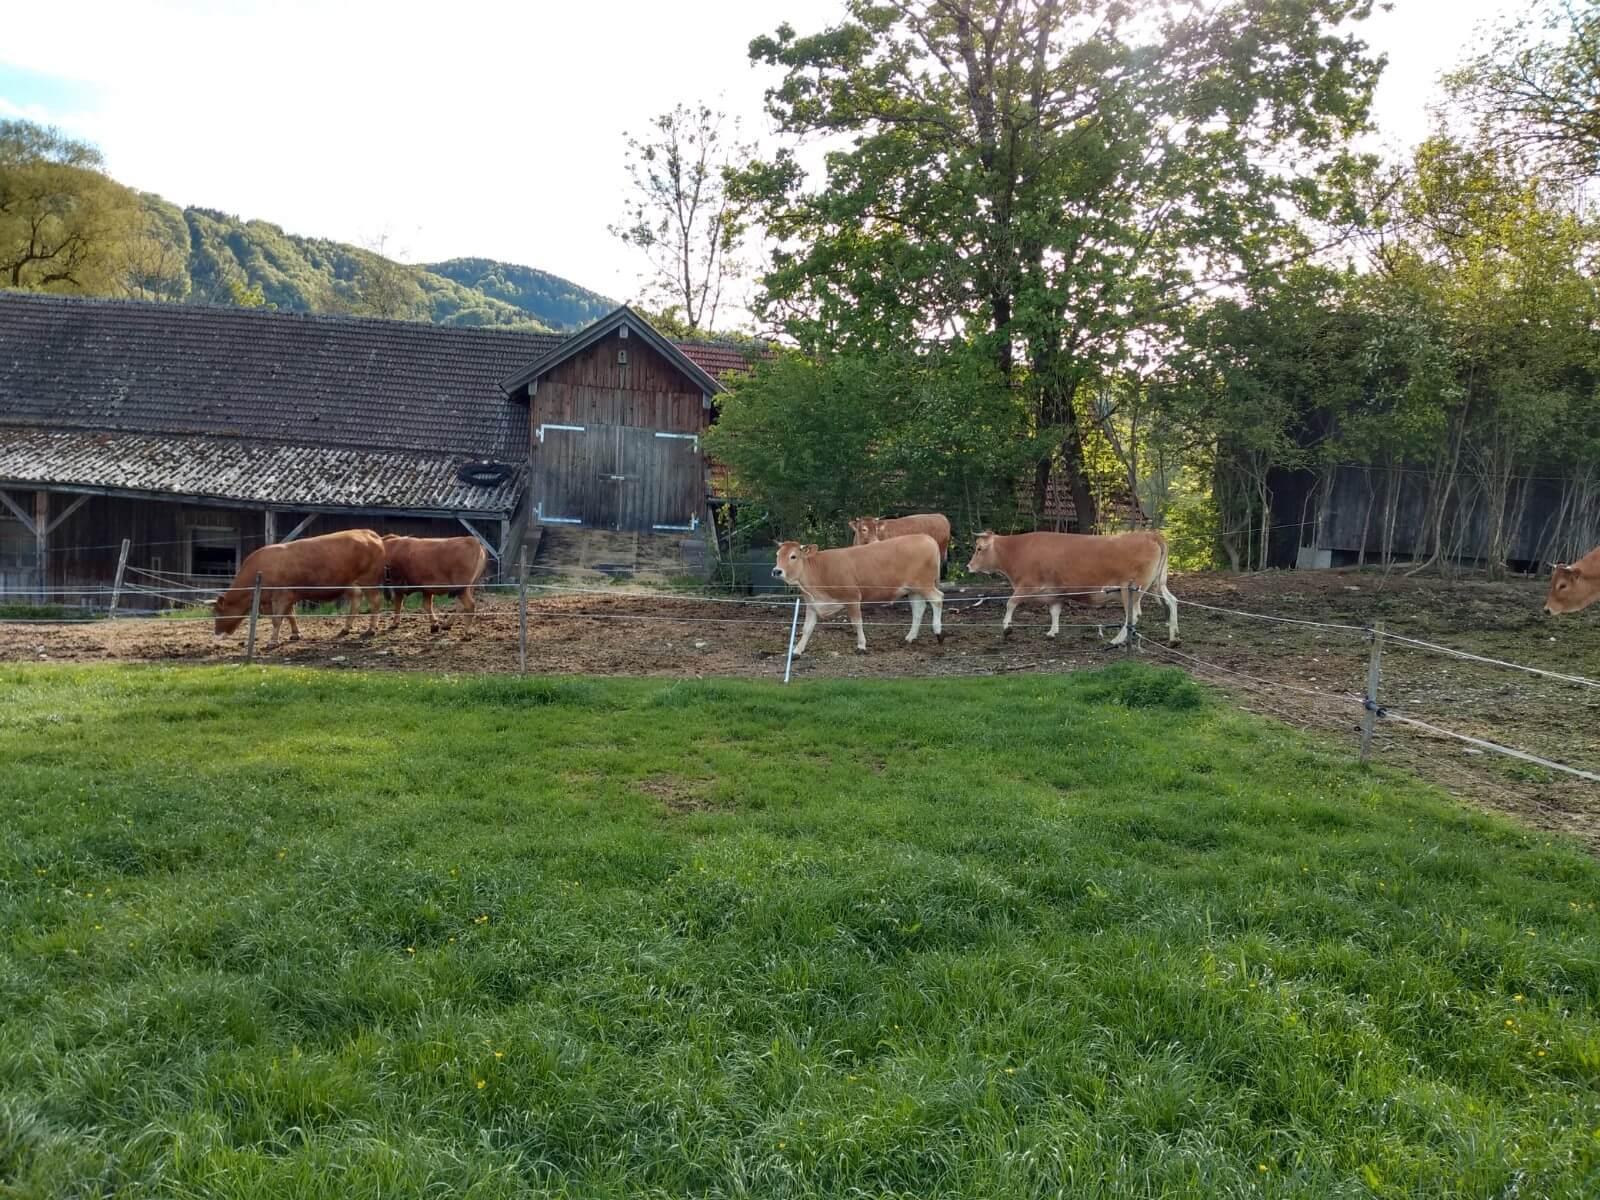 Kühe am Stall